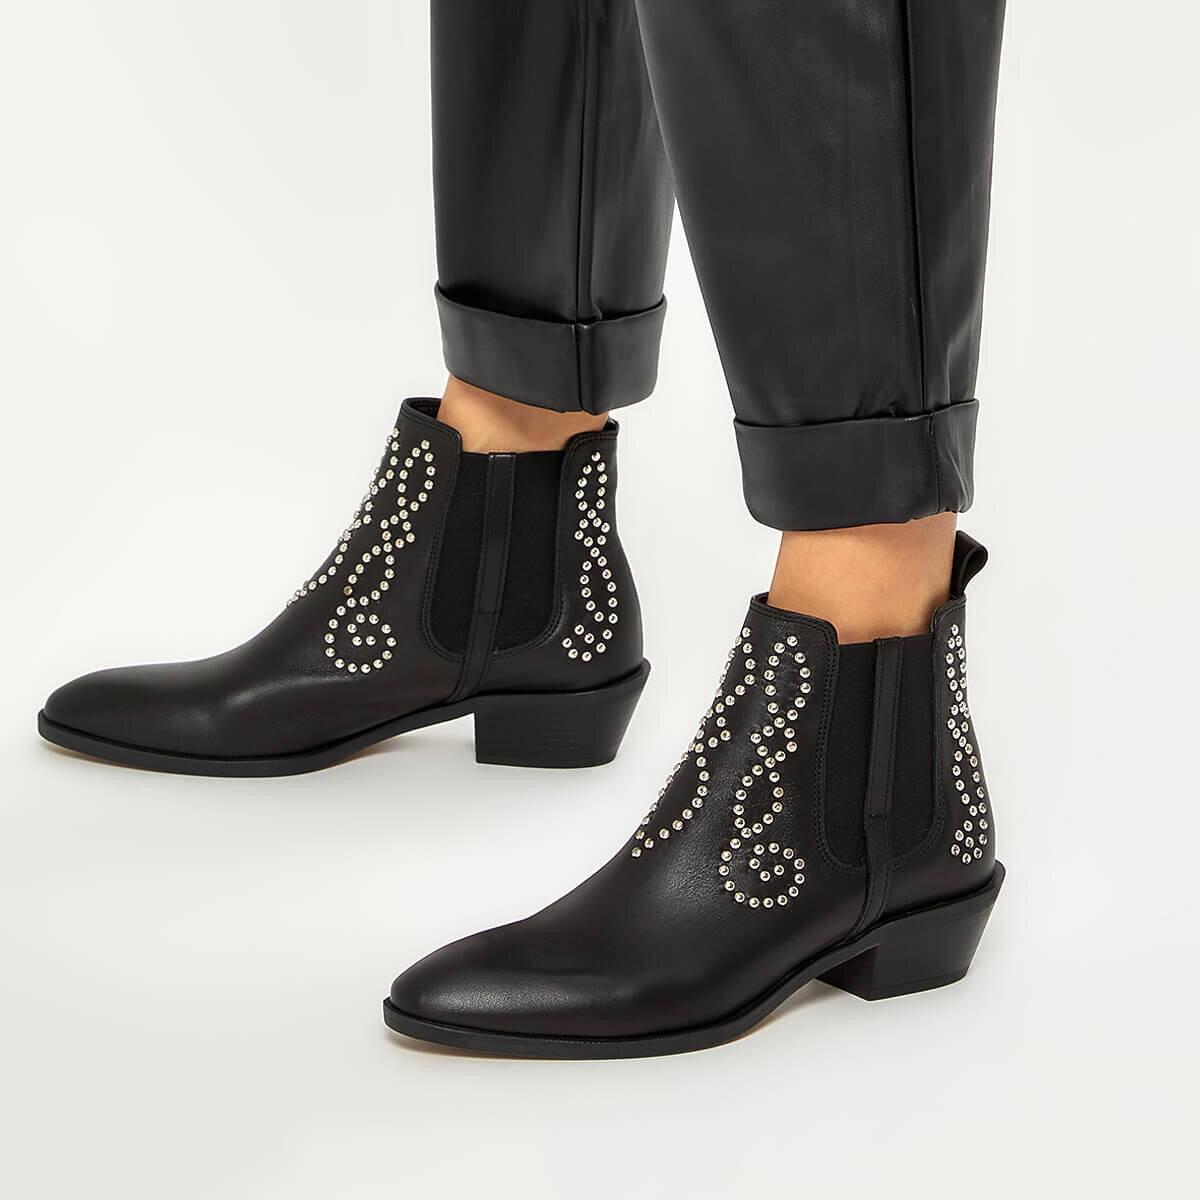 WEAL Siyah Kadın Topuklu Bot